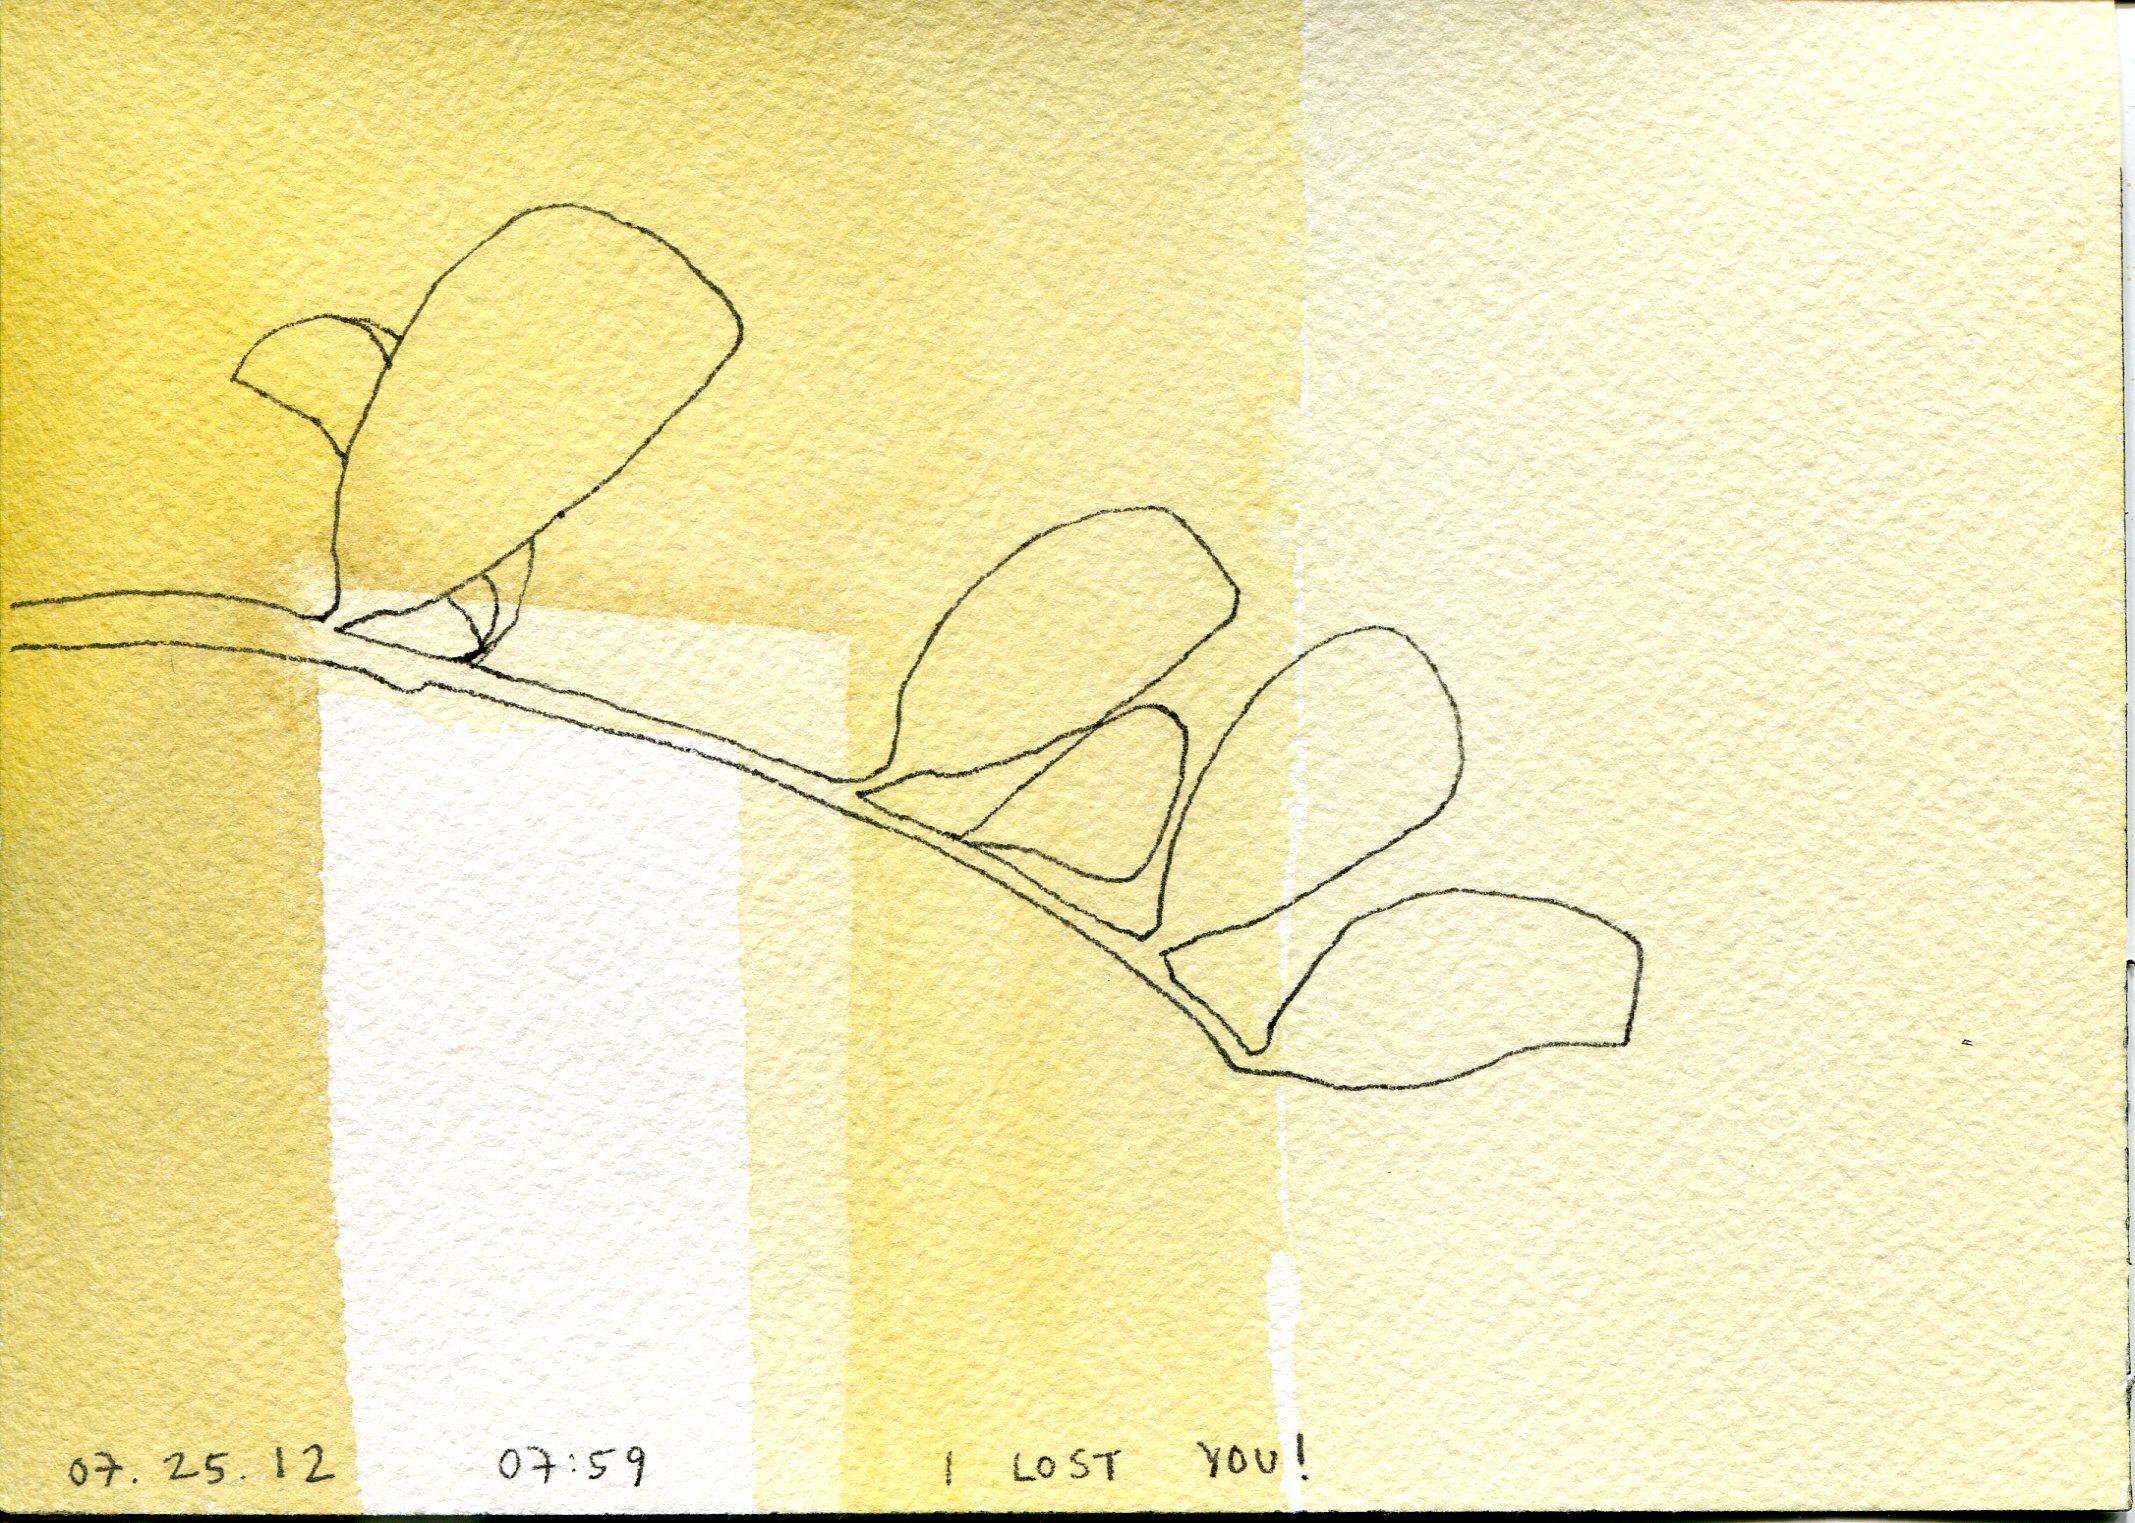 2012-07-29 drawing004.jpg